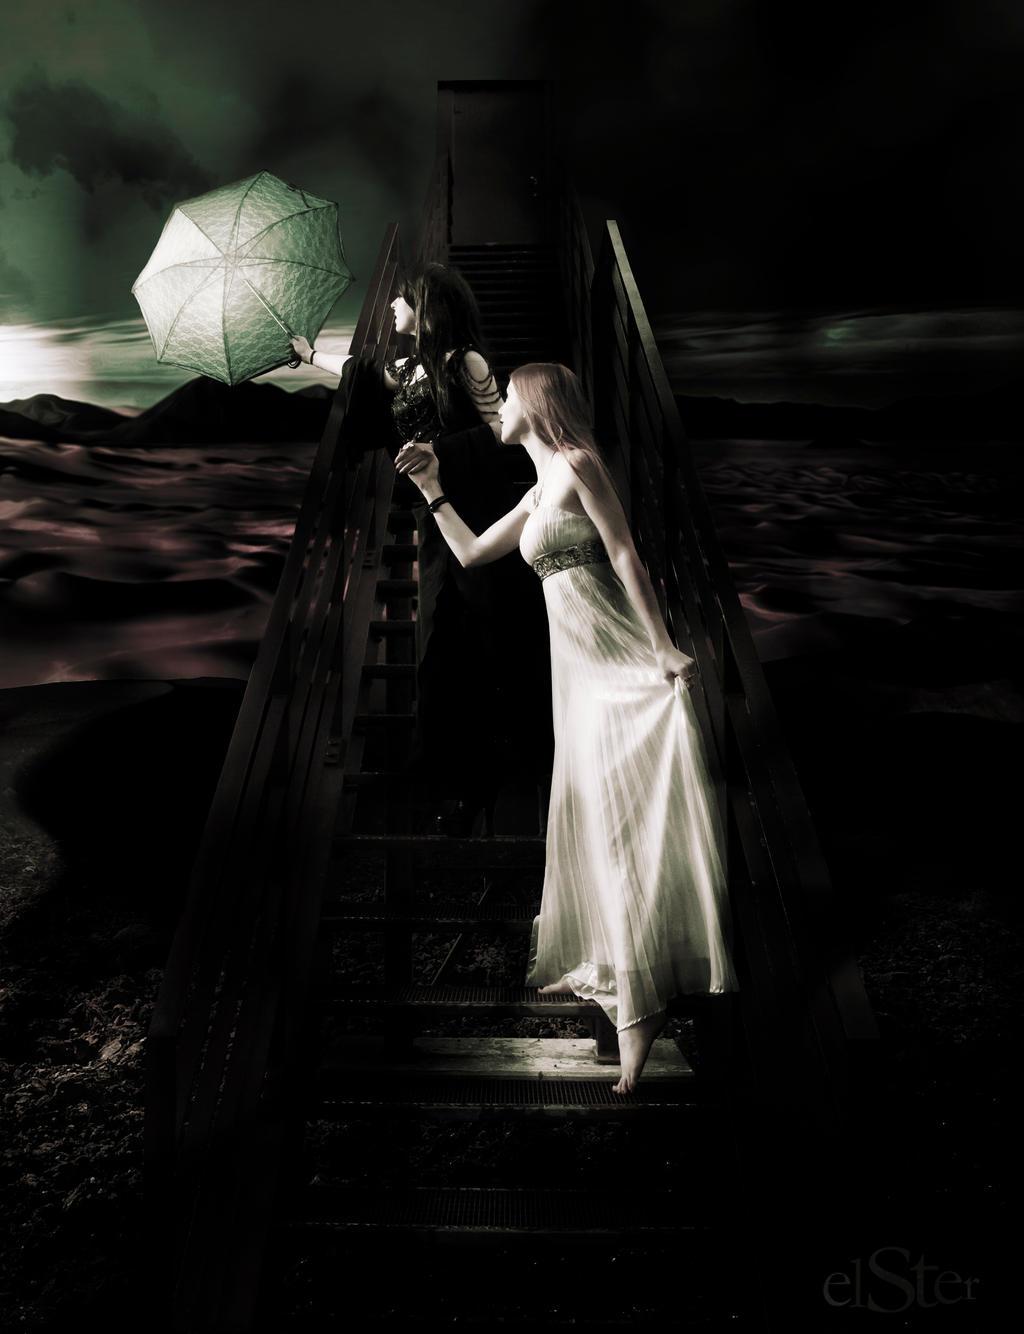 Dark Dream by DieElster